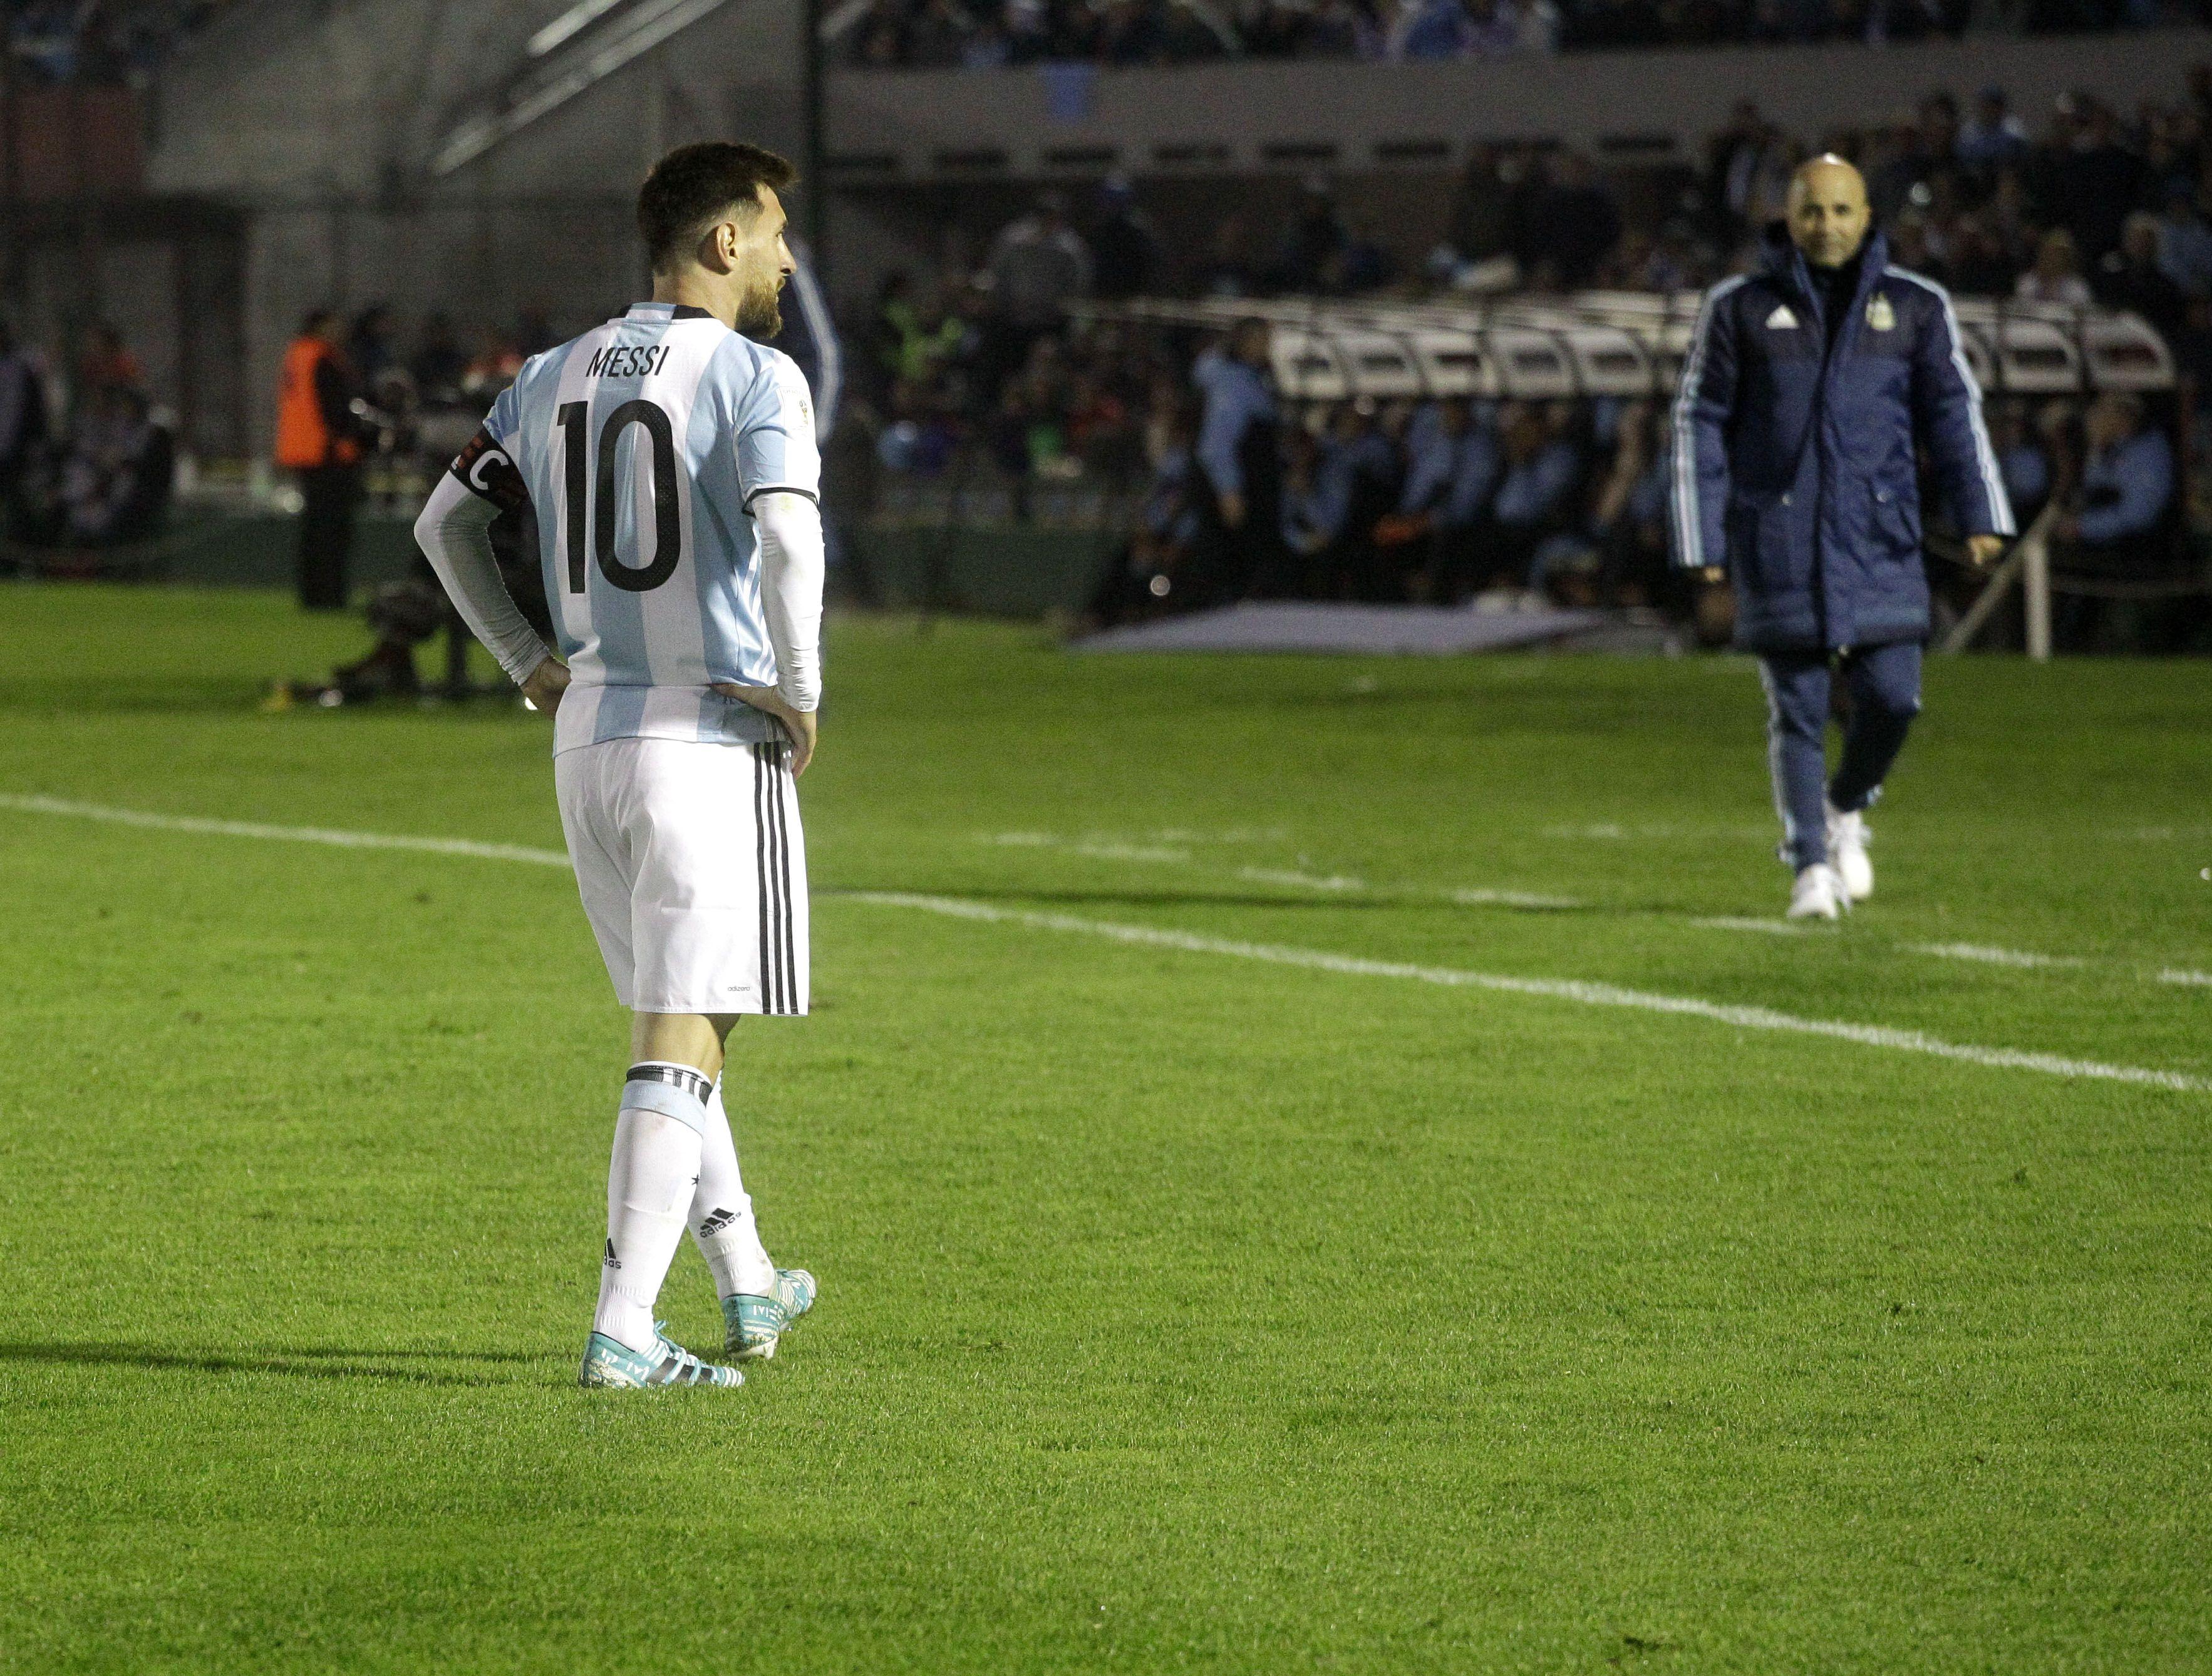 ionel Messi y Jorge Sampaoli ante Uruguay